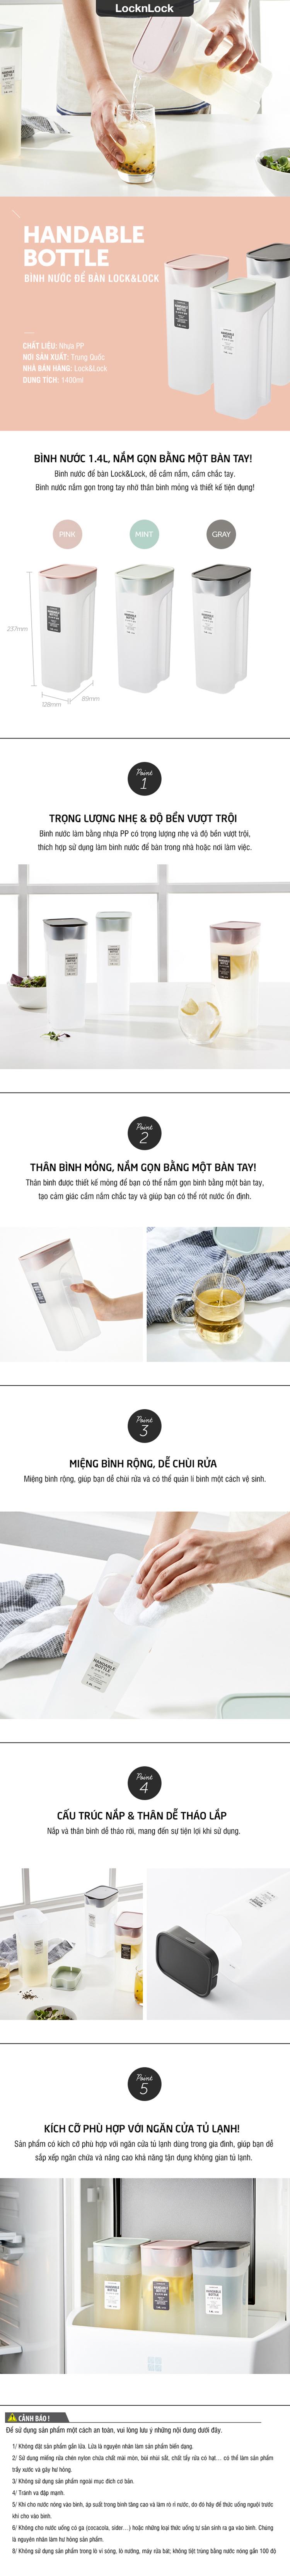 HAP817GRY-Bình nước Handle Bottle 1.4L-PP-VN-15